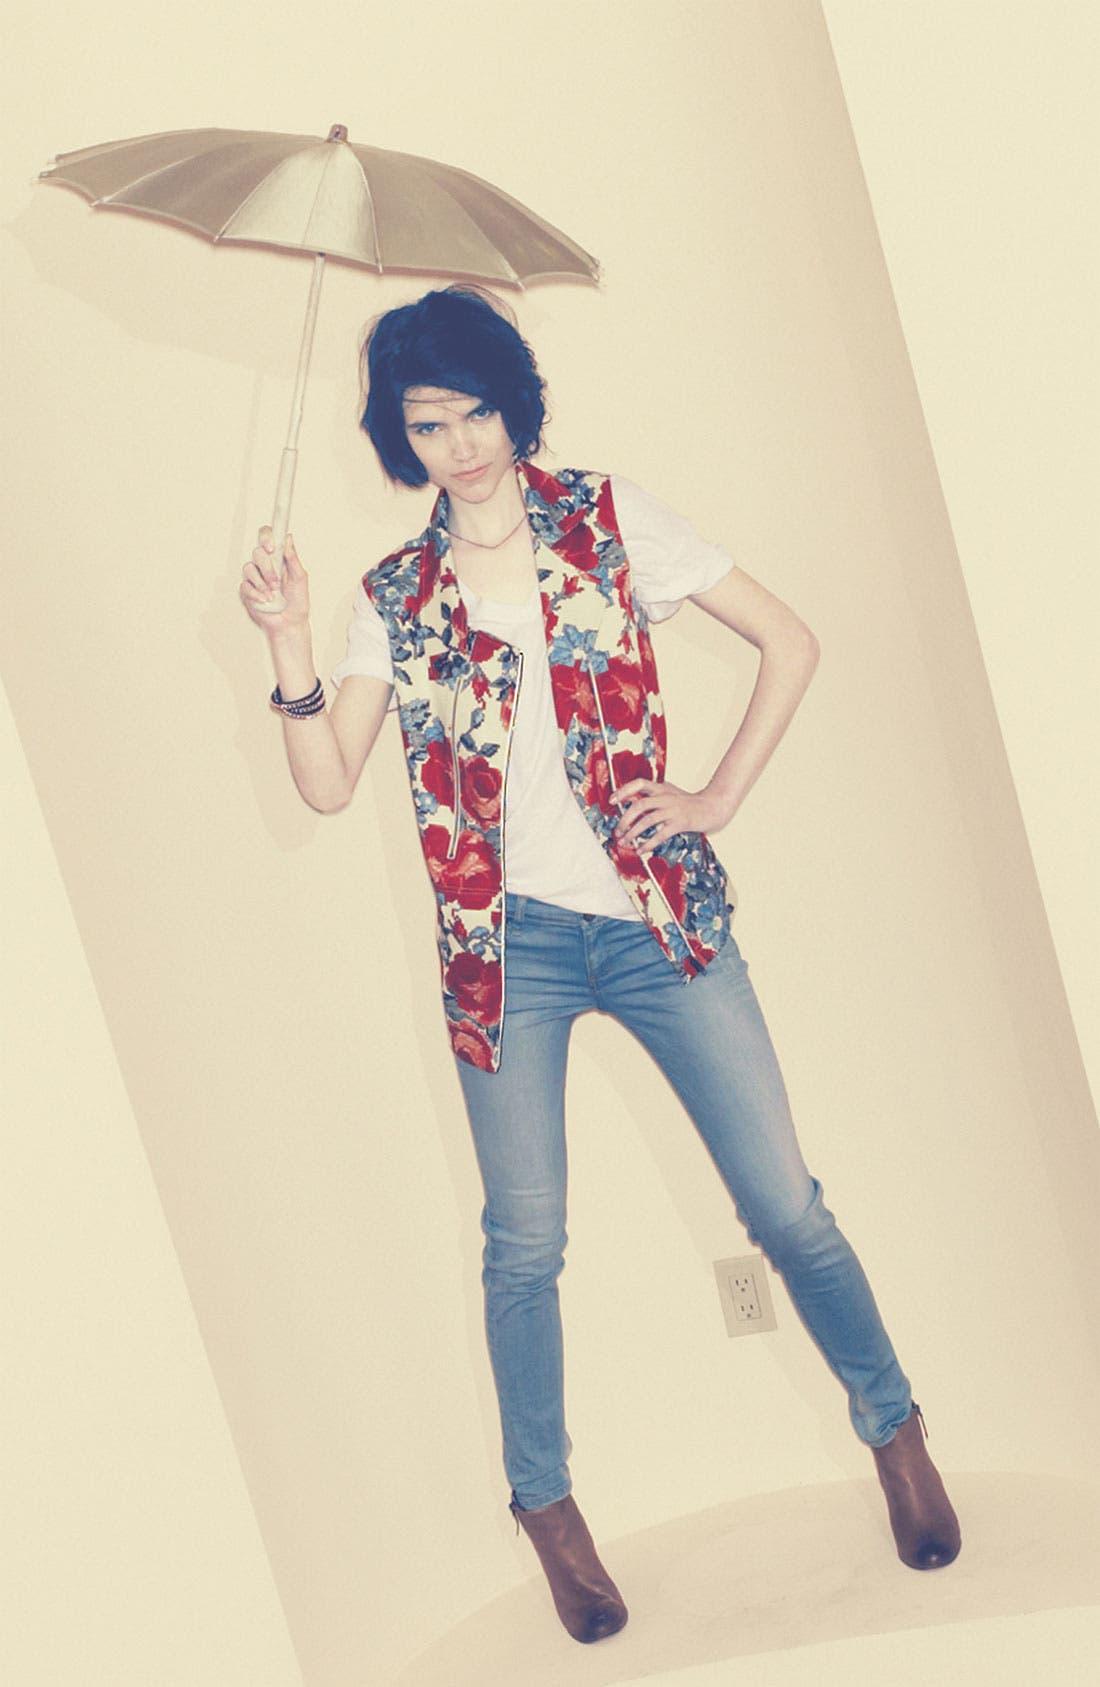 Main Image - Mural Vest, Leith Tee & edyson Jeans